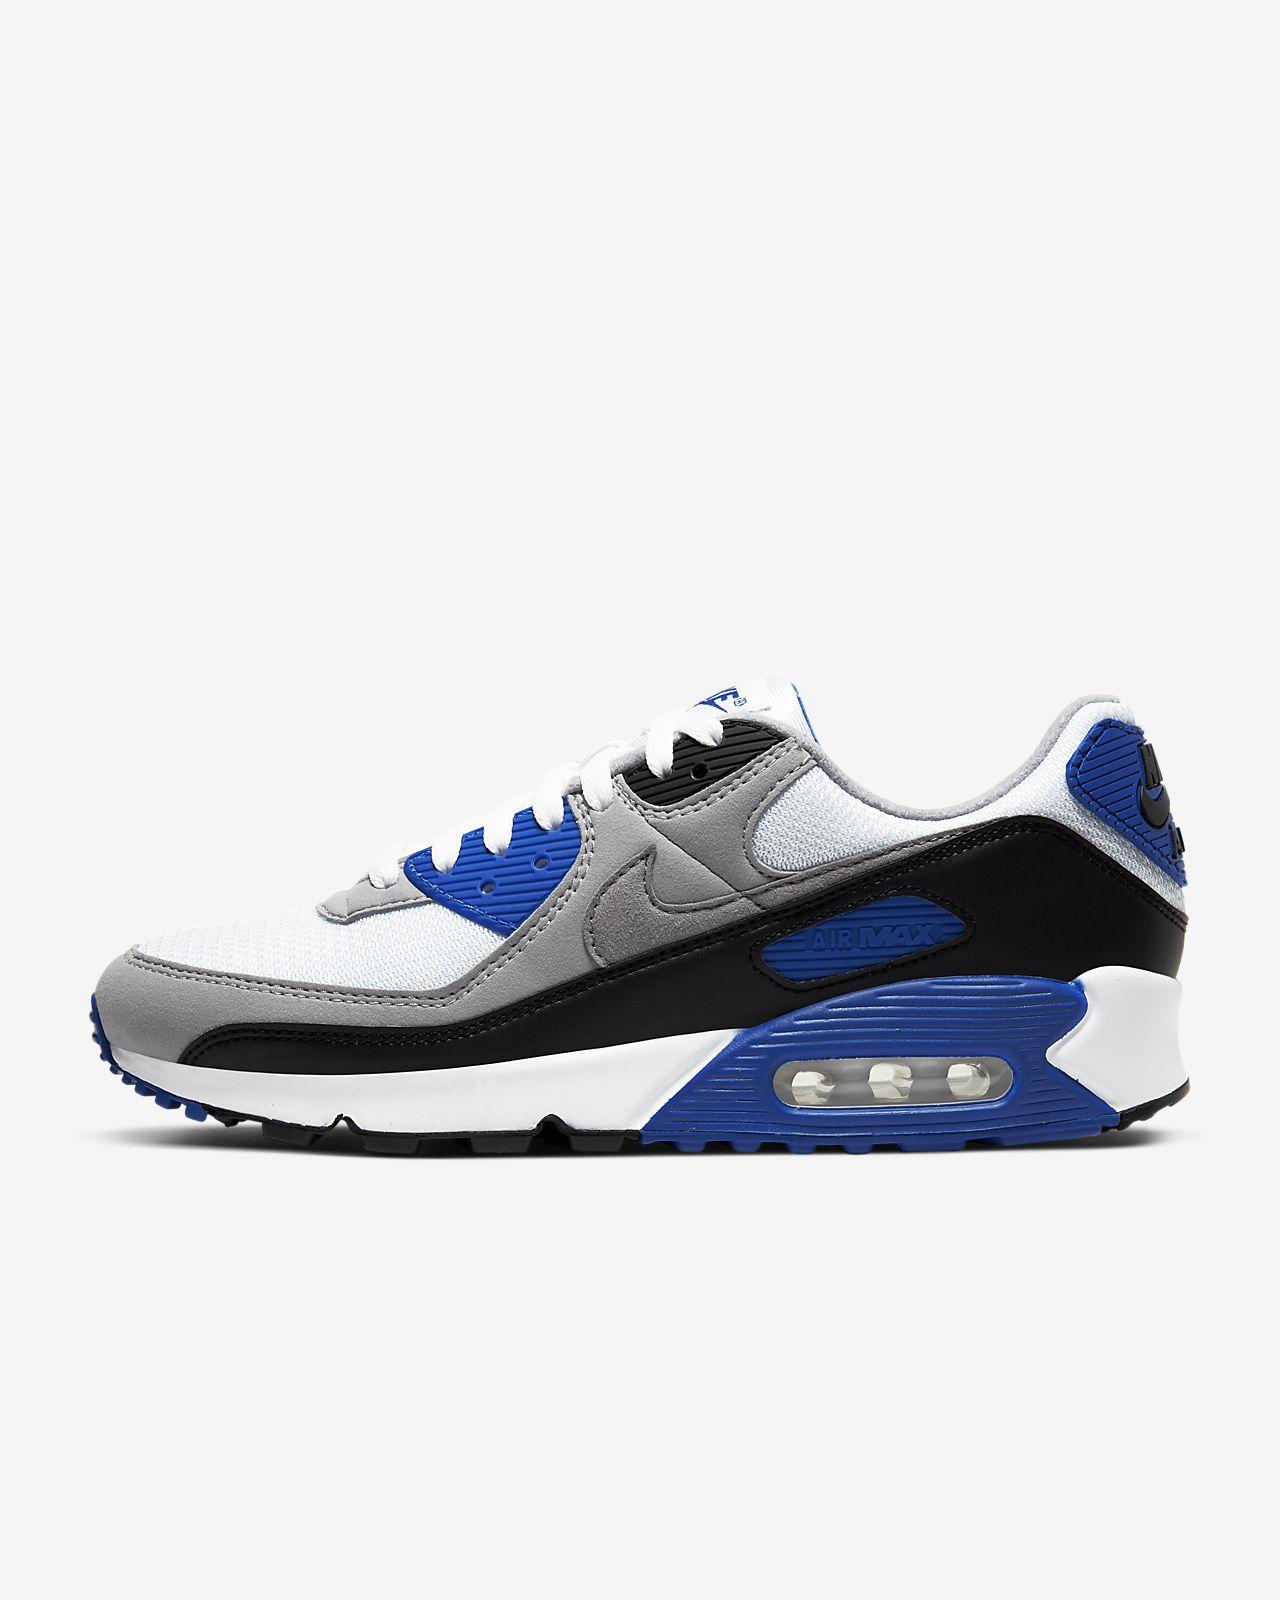 Nike Air Max Command Shoe for Men smoke greyblack hyper blue CD0873 002